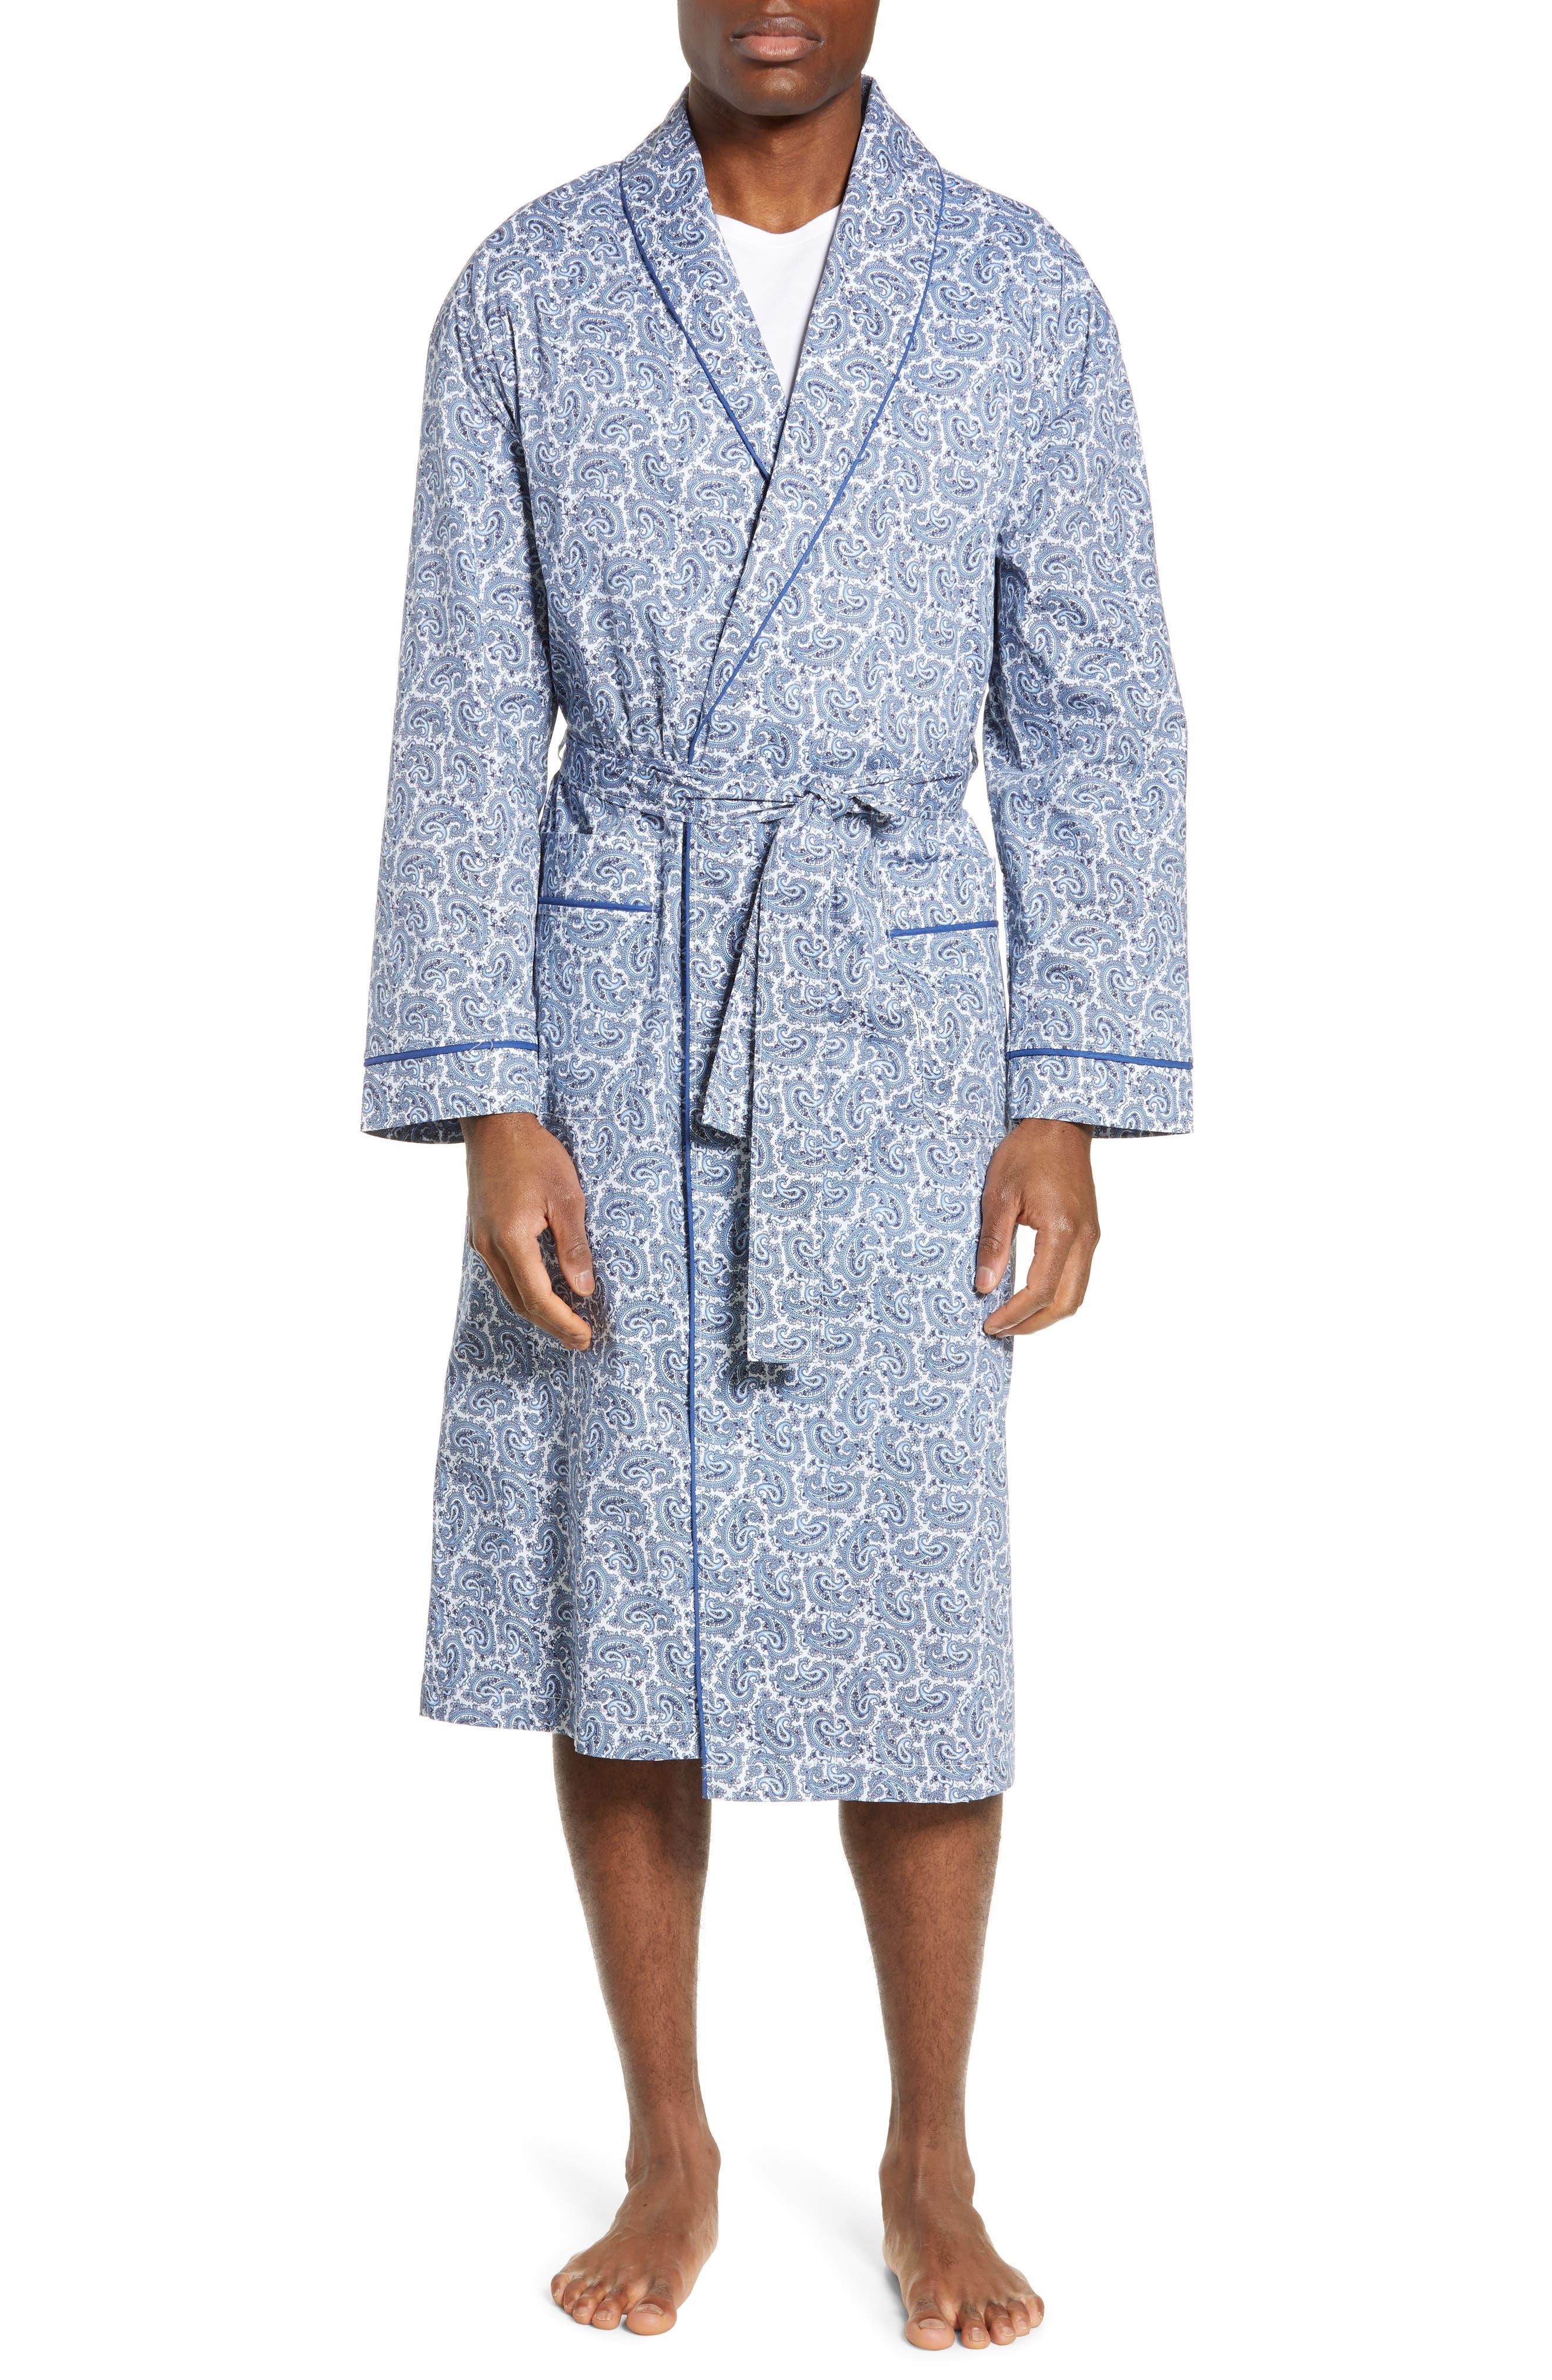 MAJESTIC INTERNATIONAL, Marbella Stretch Sateen Robe, Main thumbnail 1, color, POOL